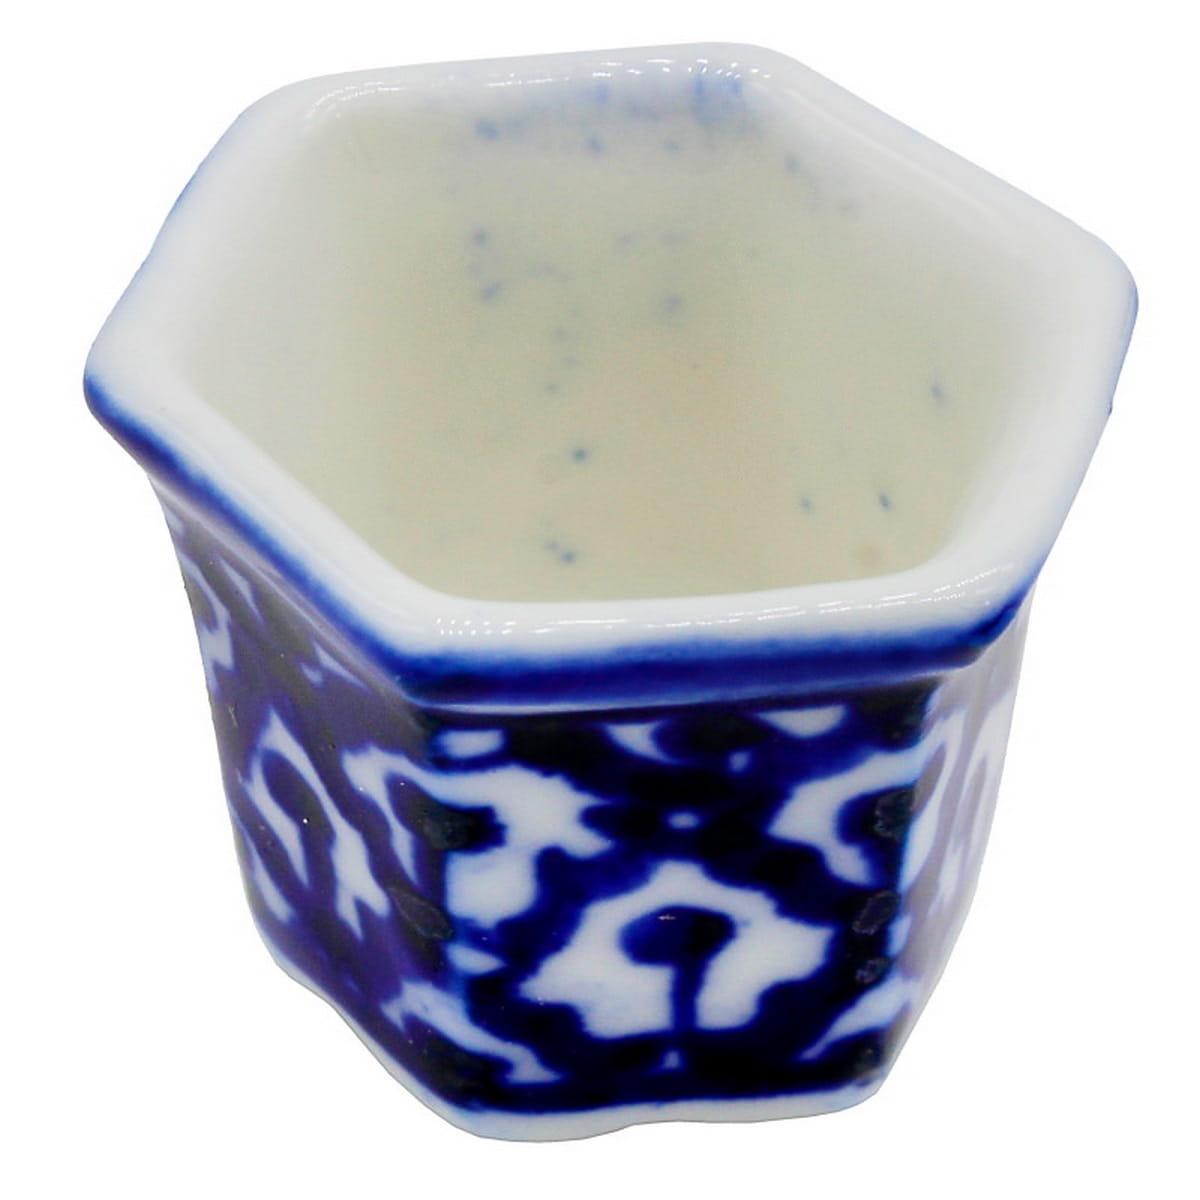 Miniature Ceramic Pot Hexagon Shape 2 Pcs (Blue)